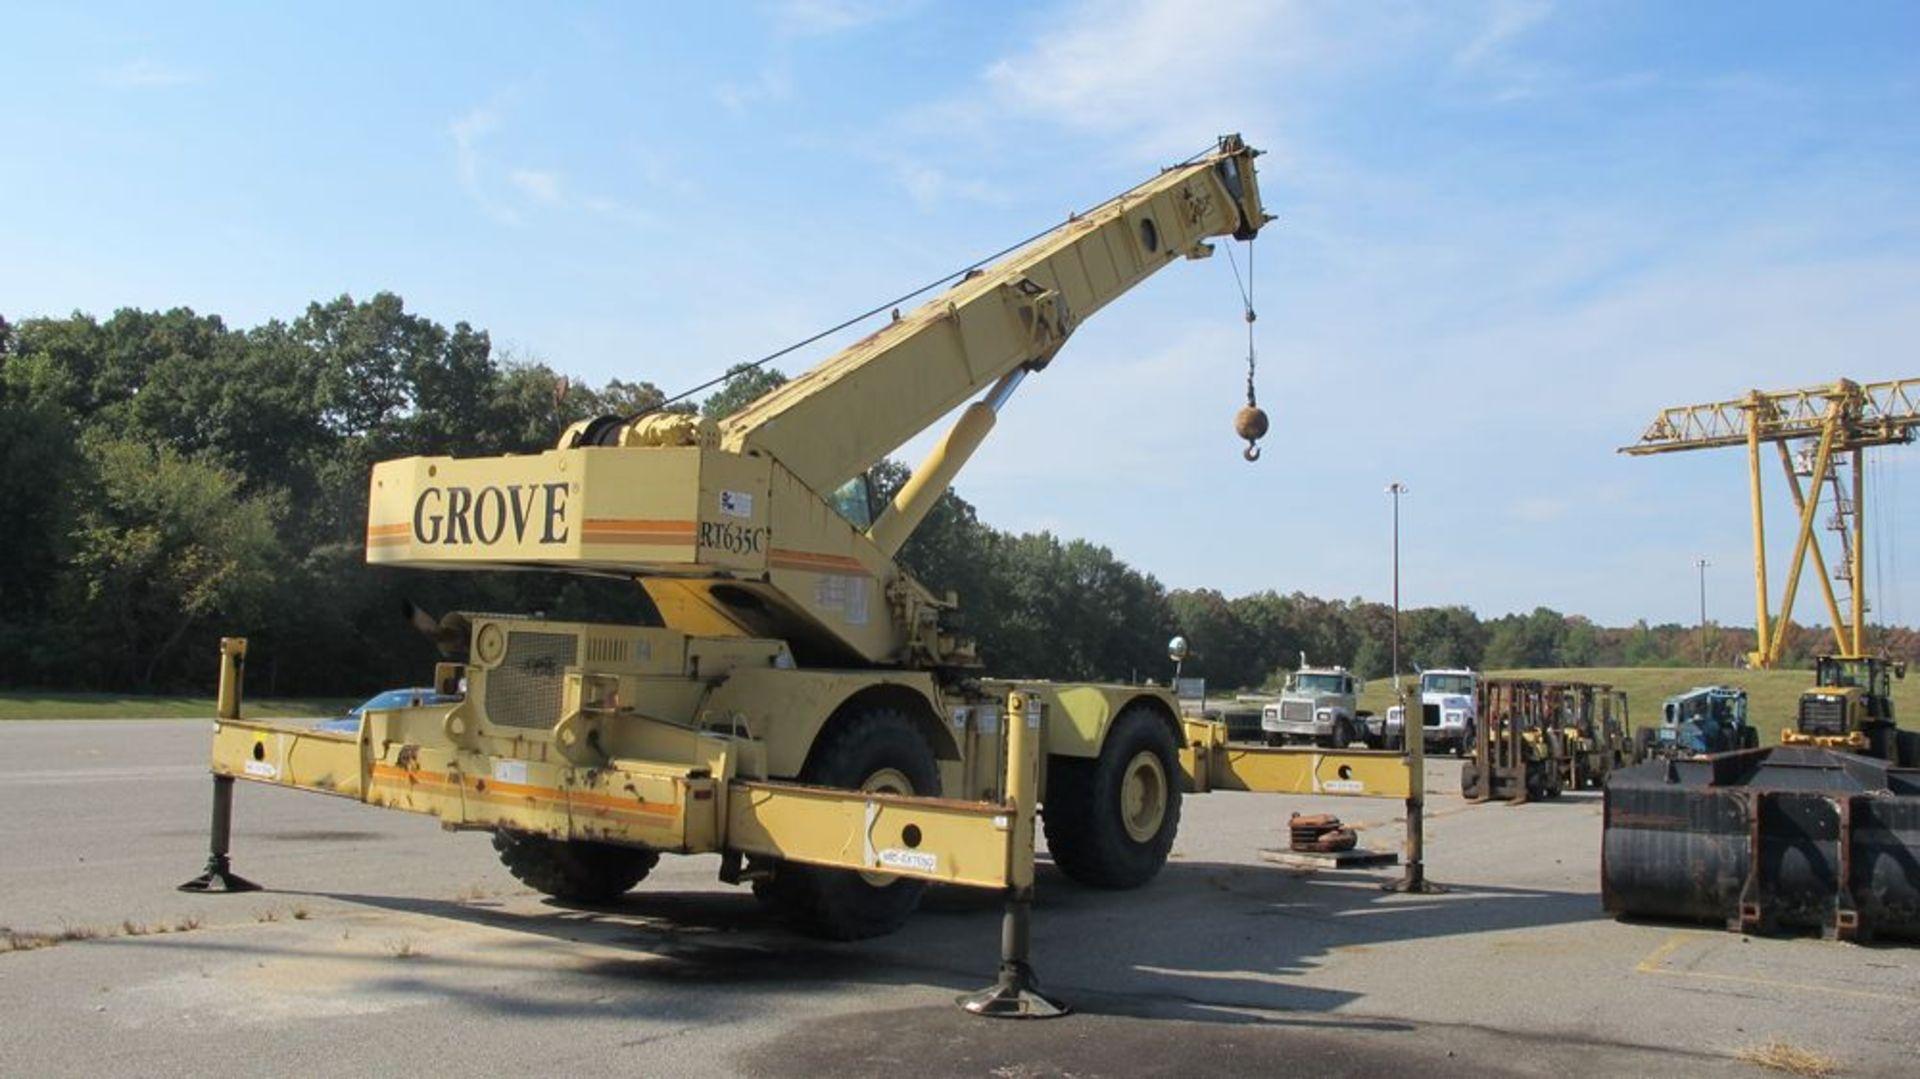 Lot 1 - GROVE RT635C, GB 100A 2360 MOBILE CRANE, VIN 1G1B318143E (RUNNING CONDITION), S/N 81323, 70000 LB